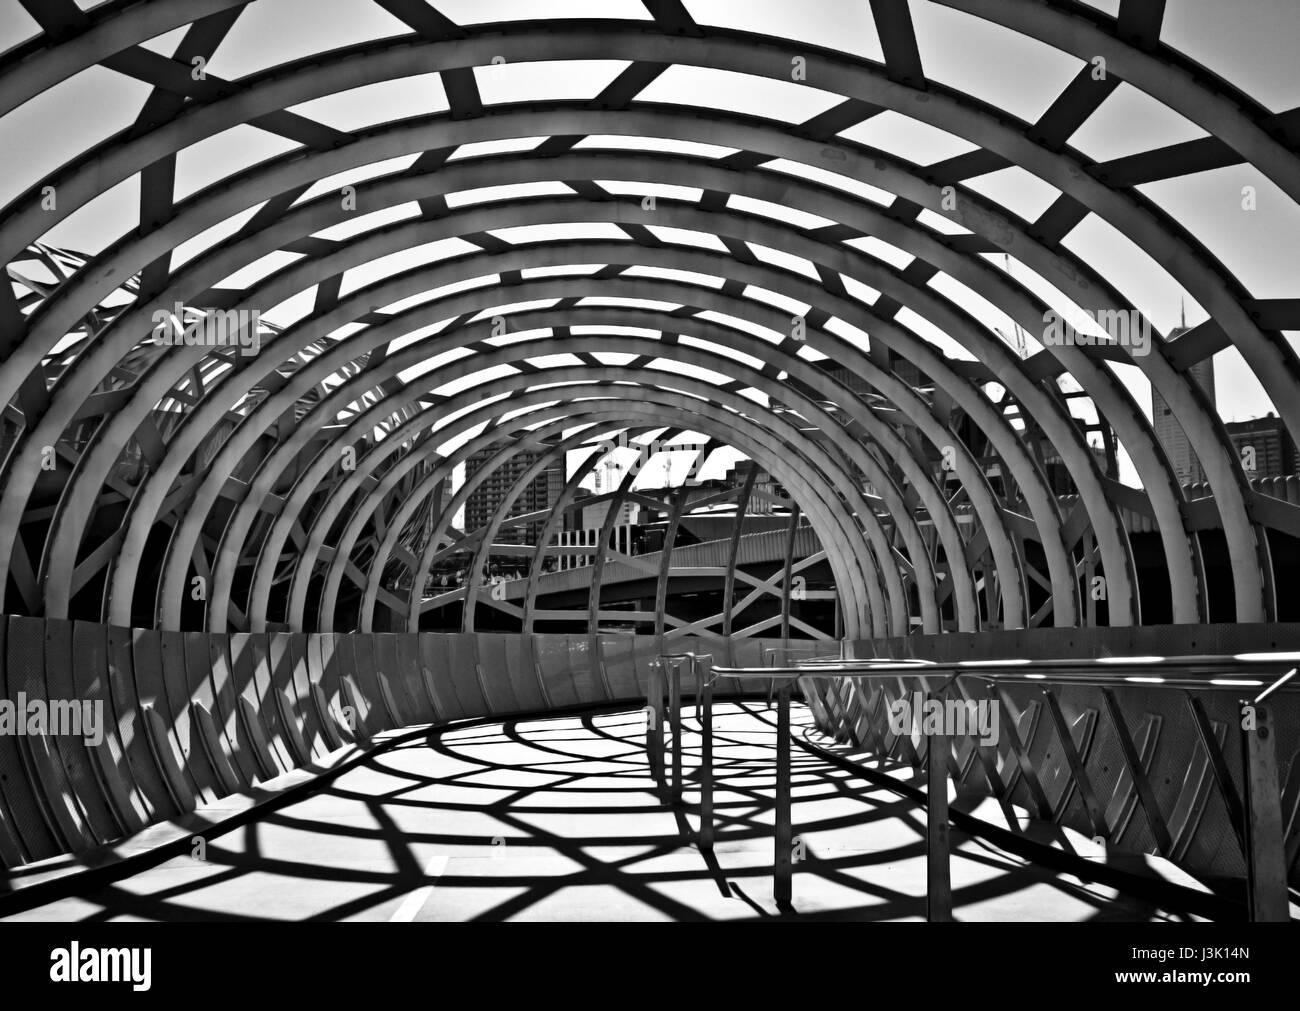 View of the Webb Bridge, Docklands, Melbourne, Australia - Stock Image